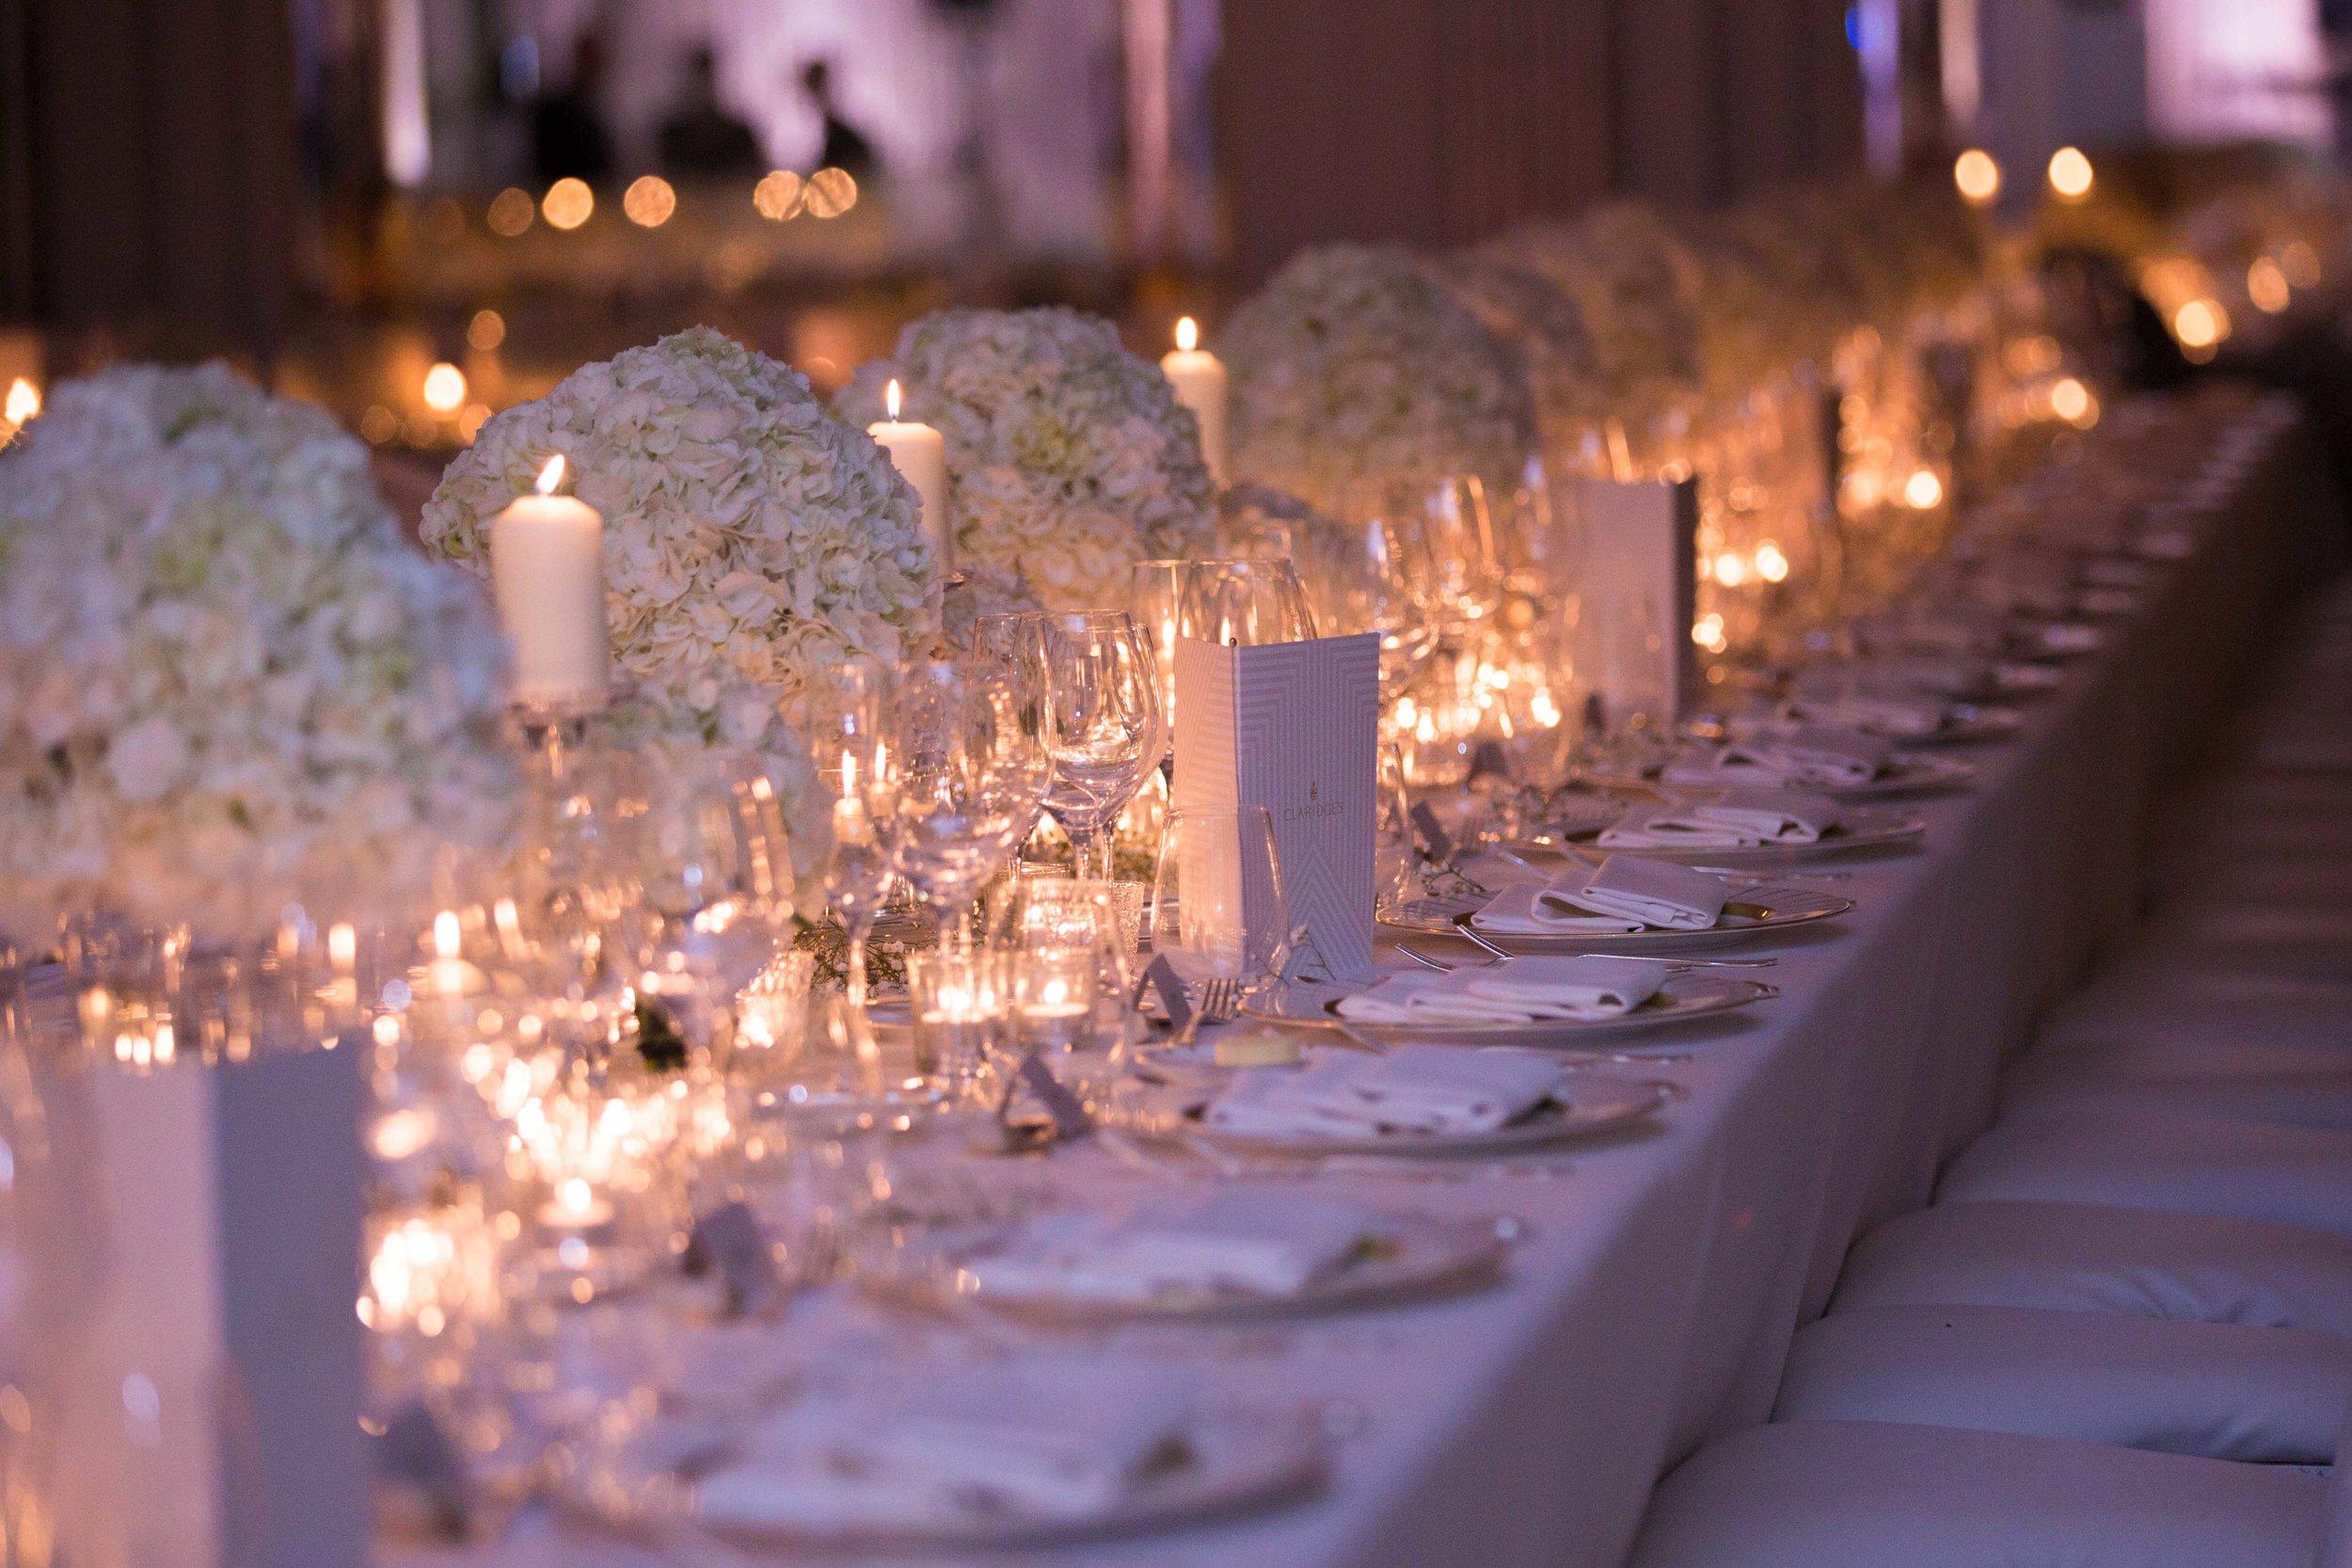 claridges-hotel-wedding-photographer-london-mayfair-natalia-smith-photography-97.jpg